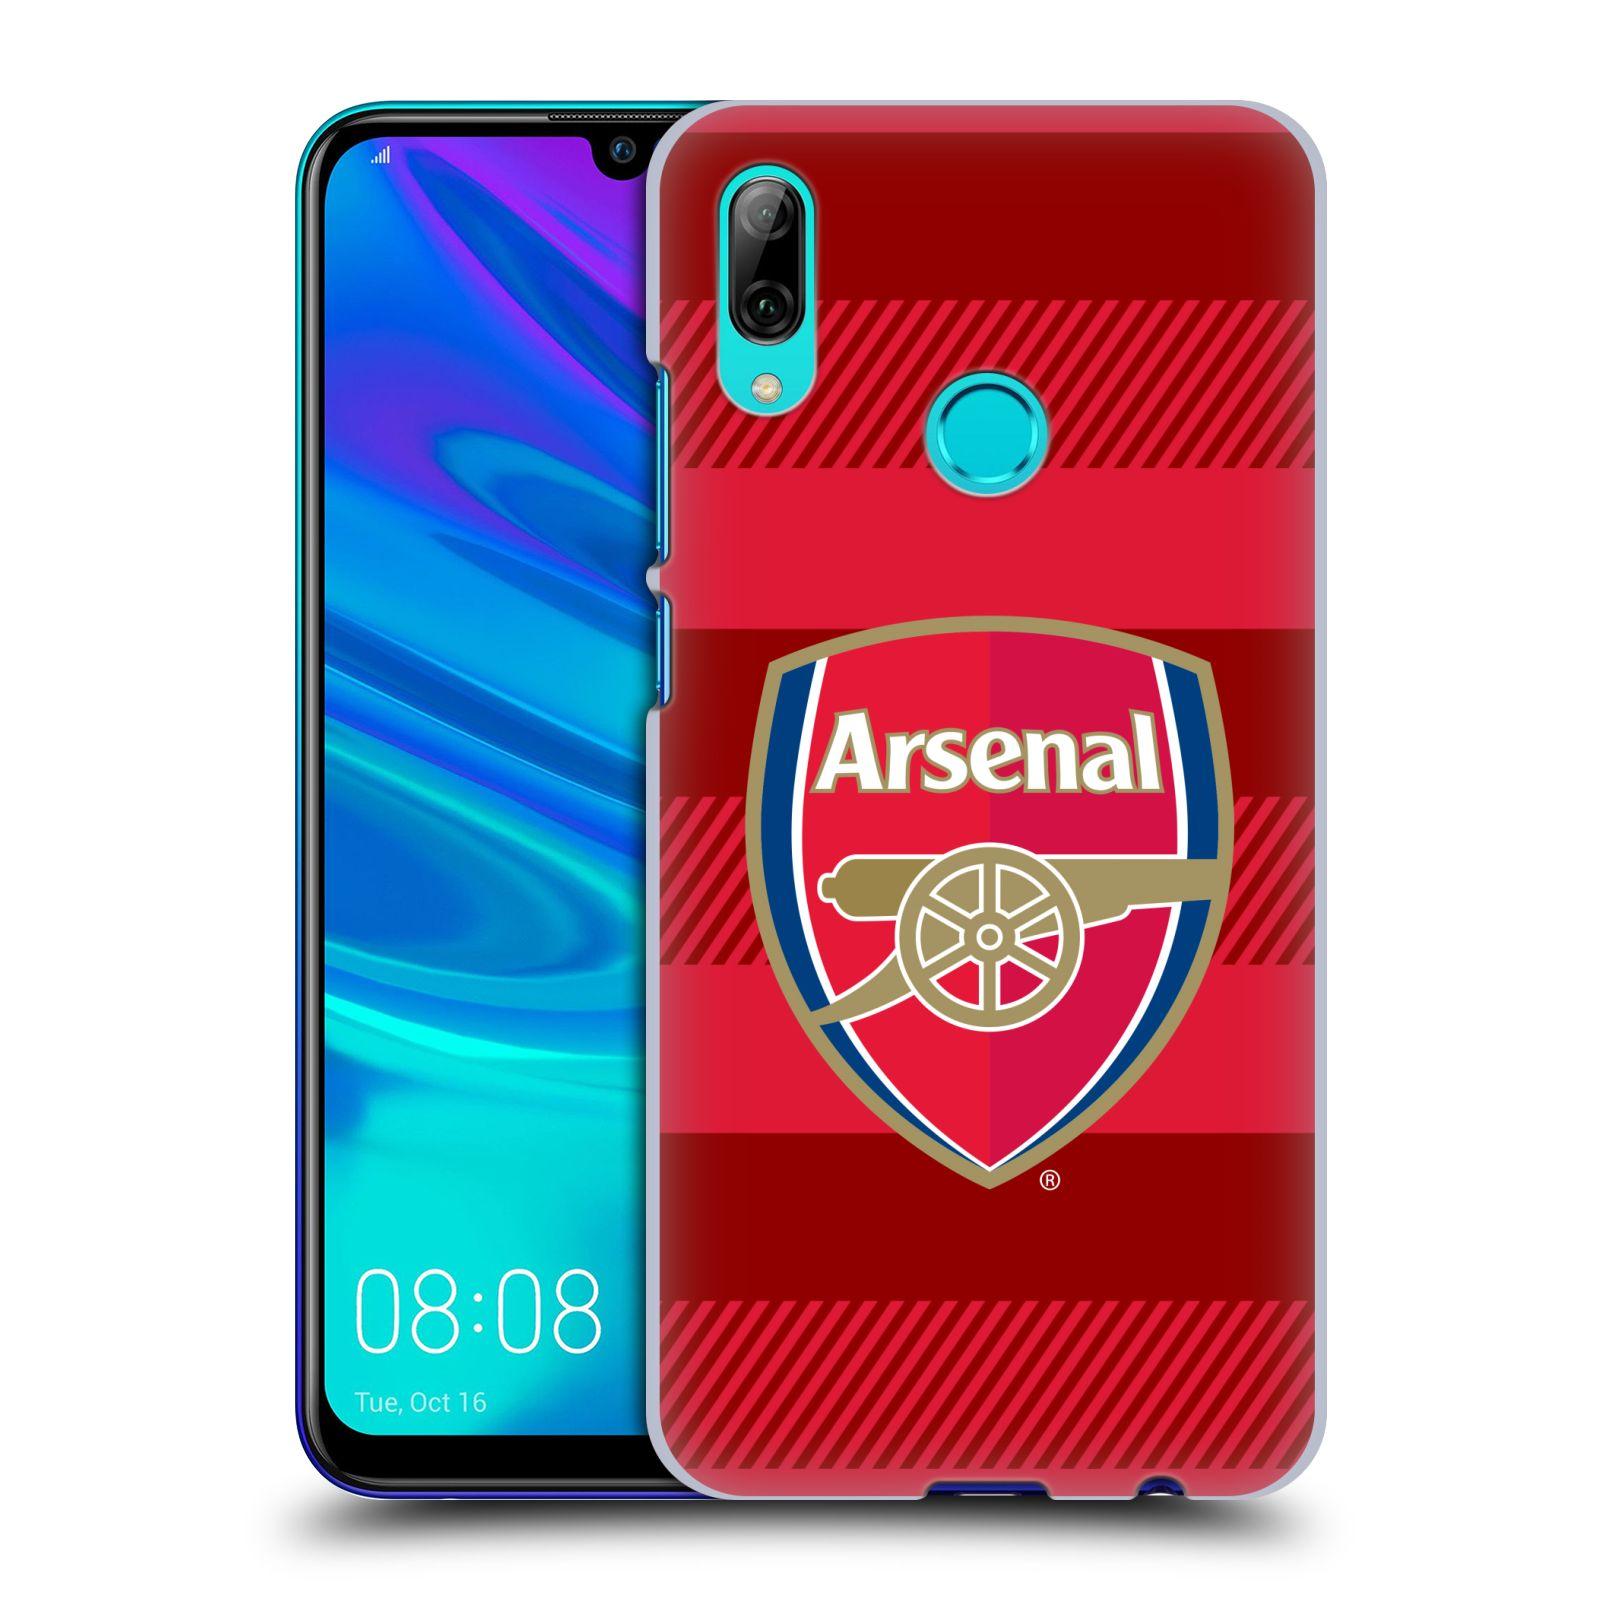 Plastové pouzdro na mobil Honor 10 Lite - Head Case - Arsenal FC - Logo s pruhy